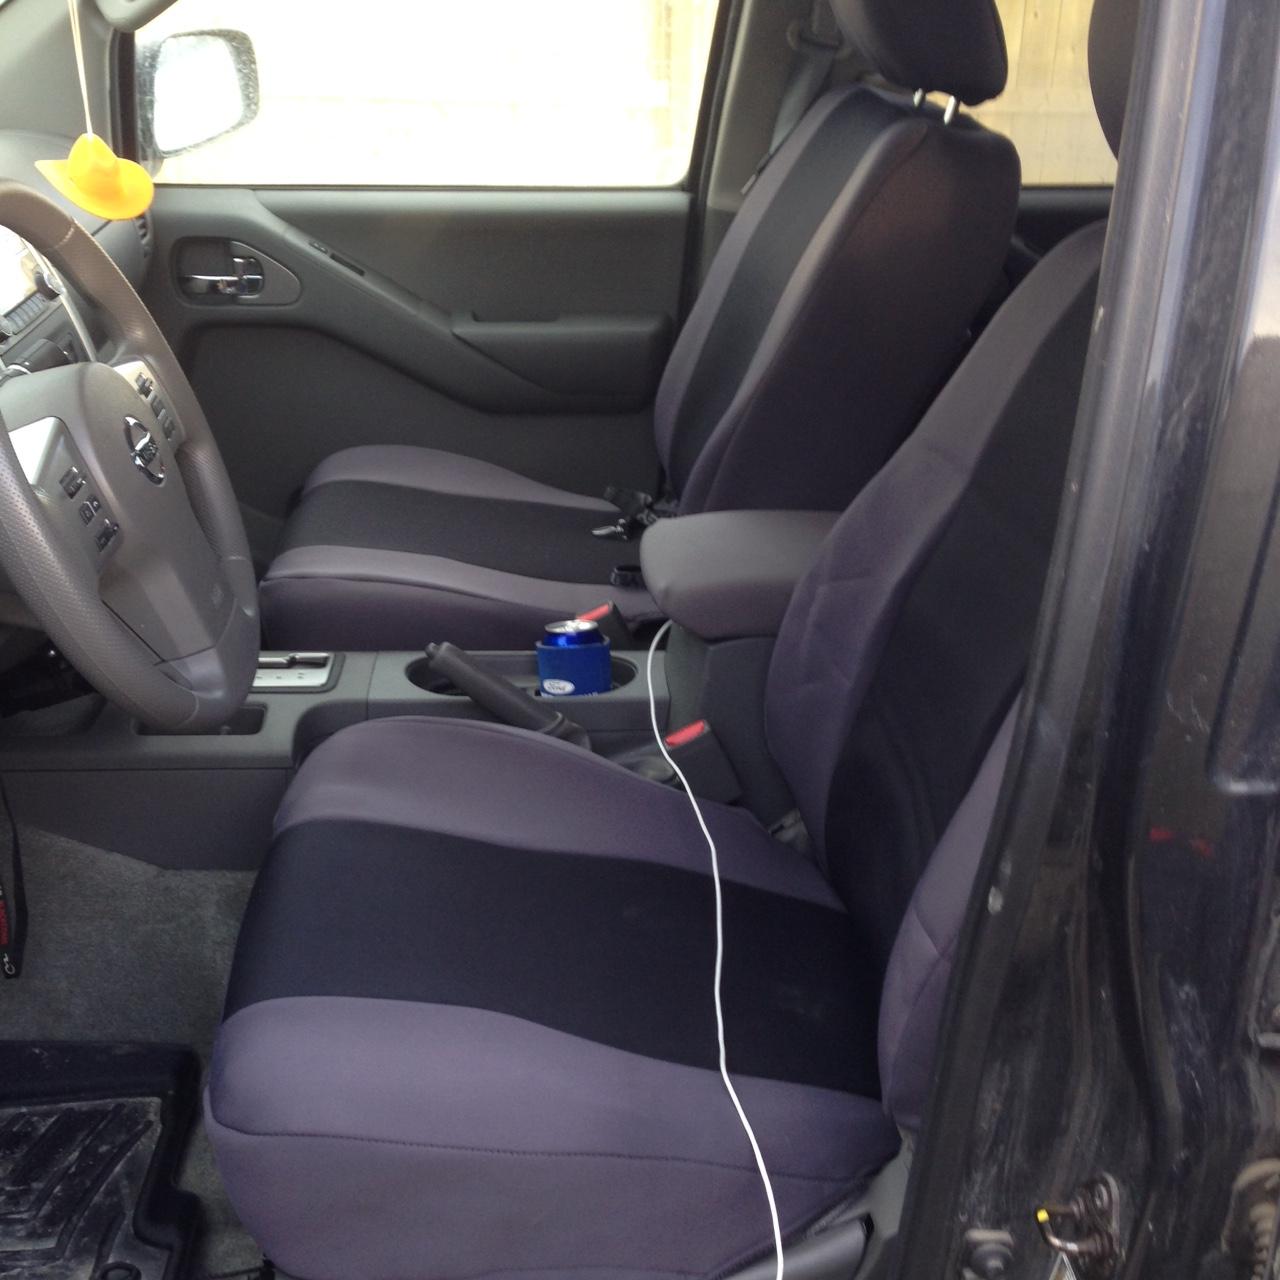 Nissan Frontier Seat Covers >> Neoprene Seat Covers Nissan Frontier Forum